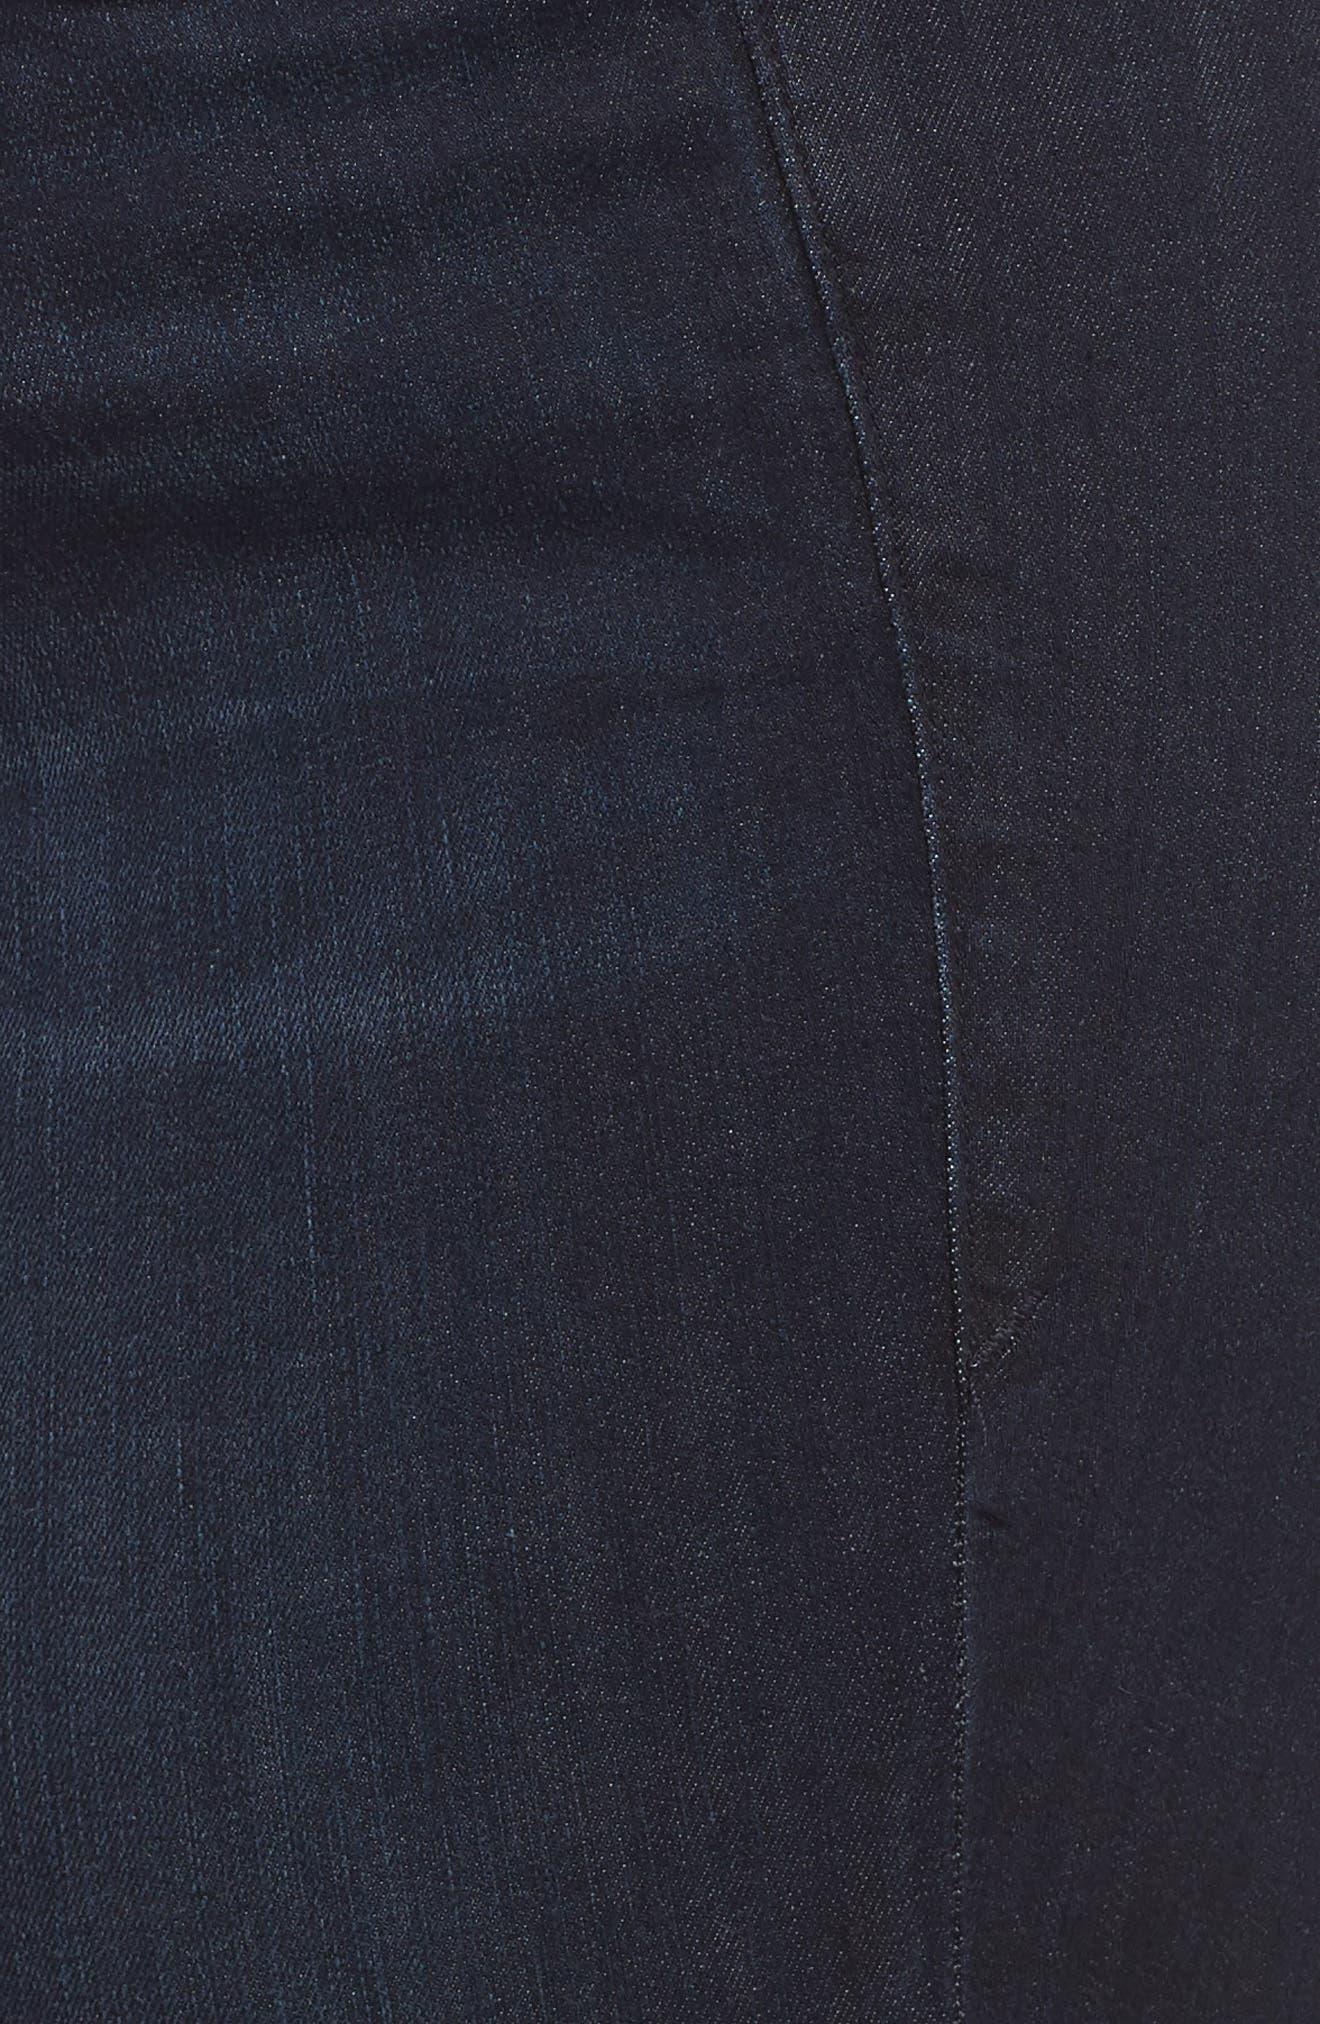 GOOD AMERICAN,                             Good Legs High Waist Skinny Jeans,                             Alternate thumbnail 12, color,                             BLUE224